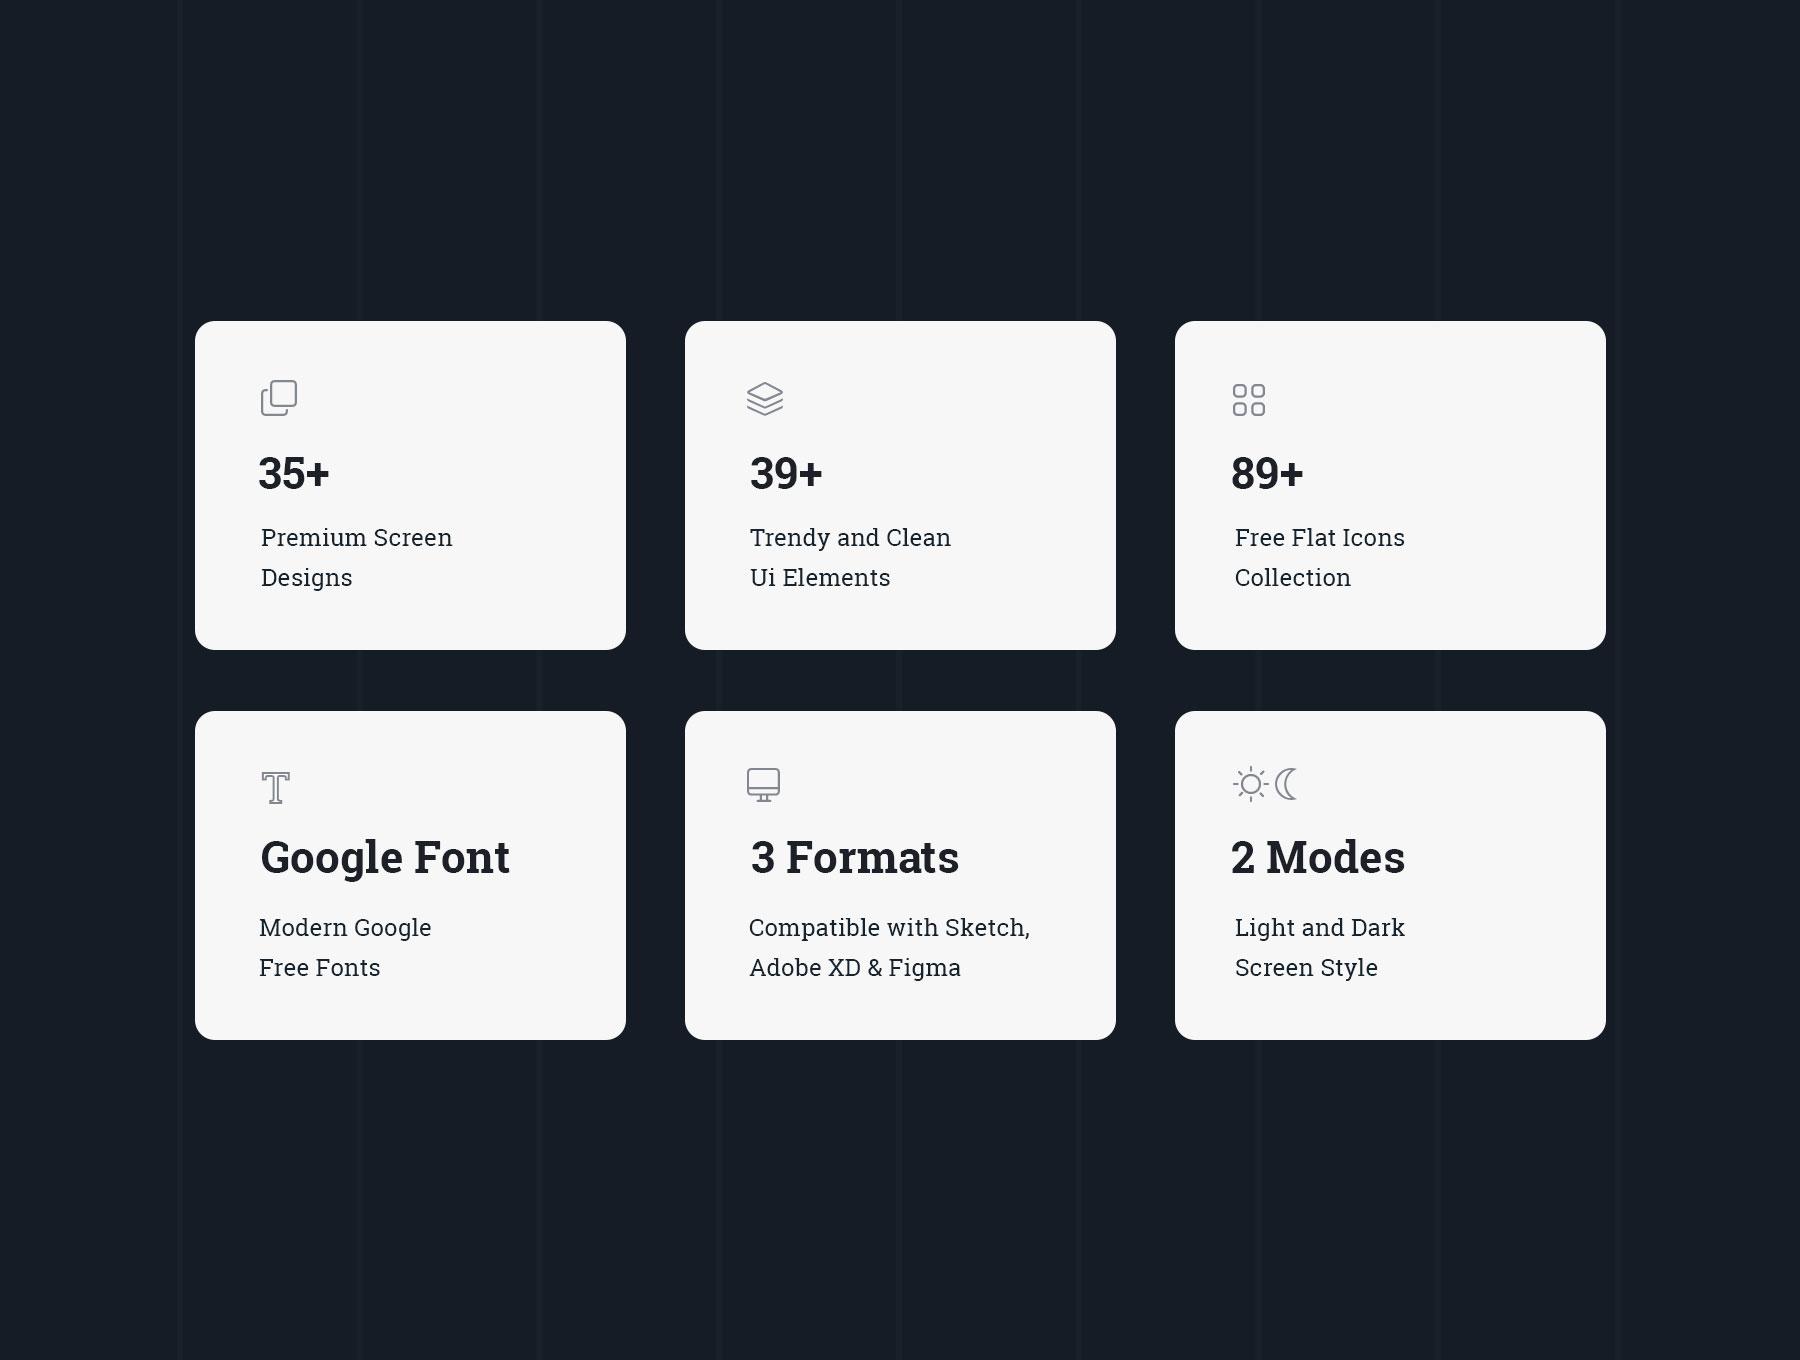 网站后台管理仪表板UI界面设计Sketch模板 Meher – Admin Dashboard Ui Kit Sketch Template插图(3)